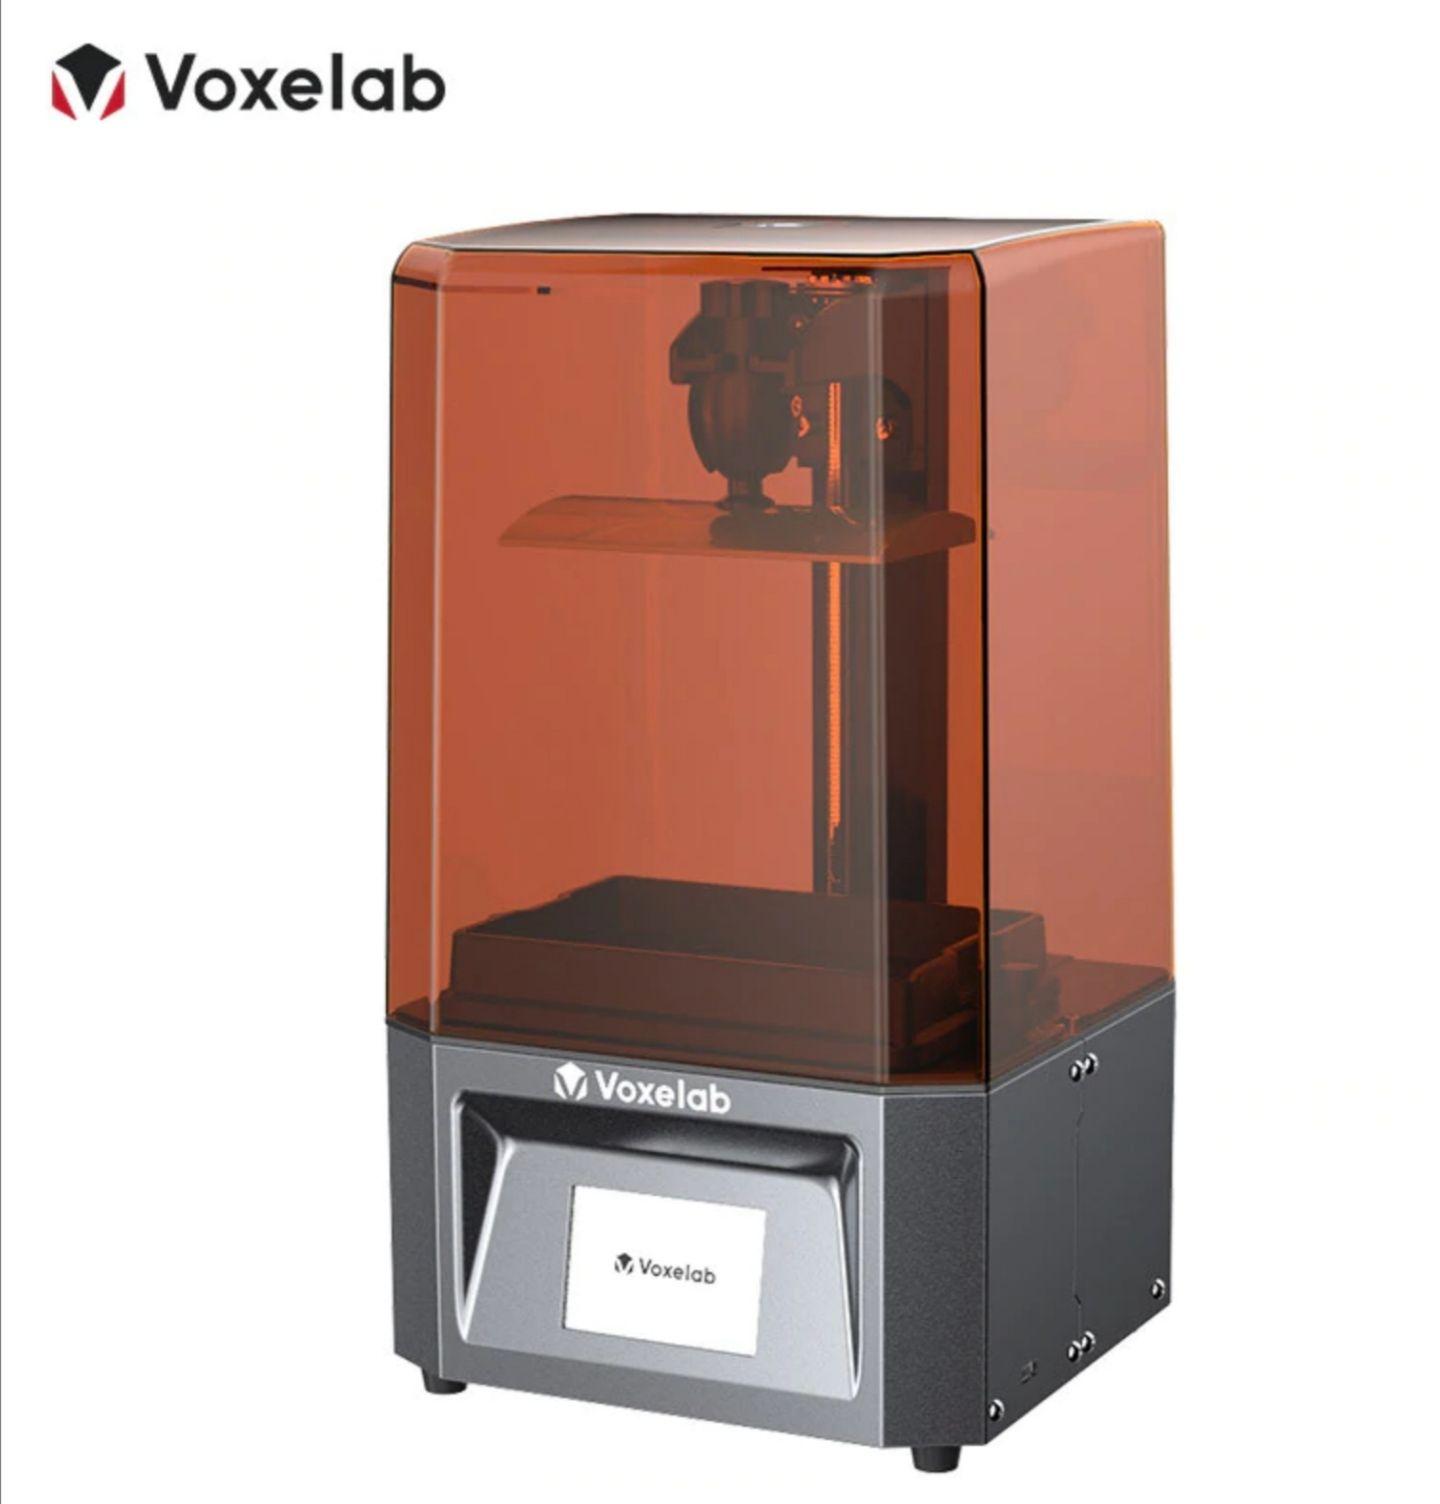 Voxelab Proxima 3D Printer 6 inches High Precision UV Photocuring Resin Printer £125.99 @ Flashforge Official Store / AliExpress